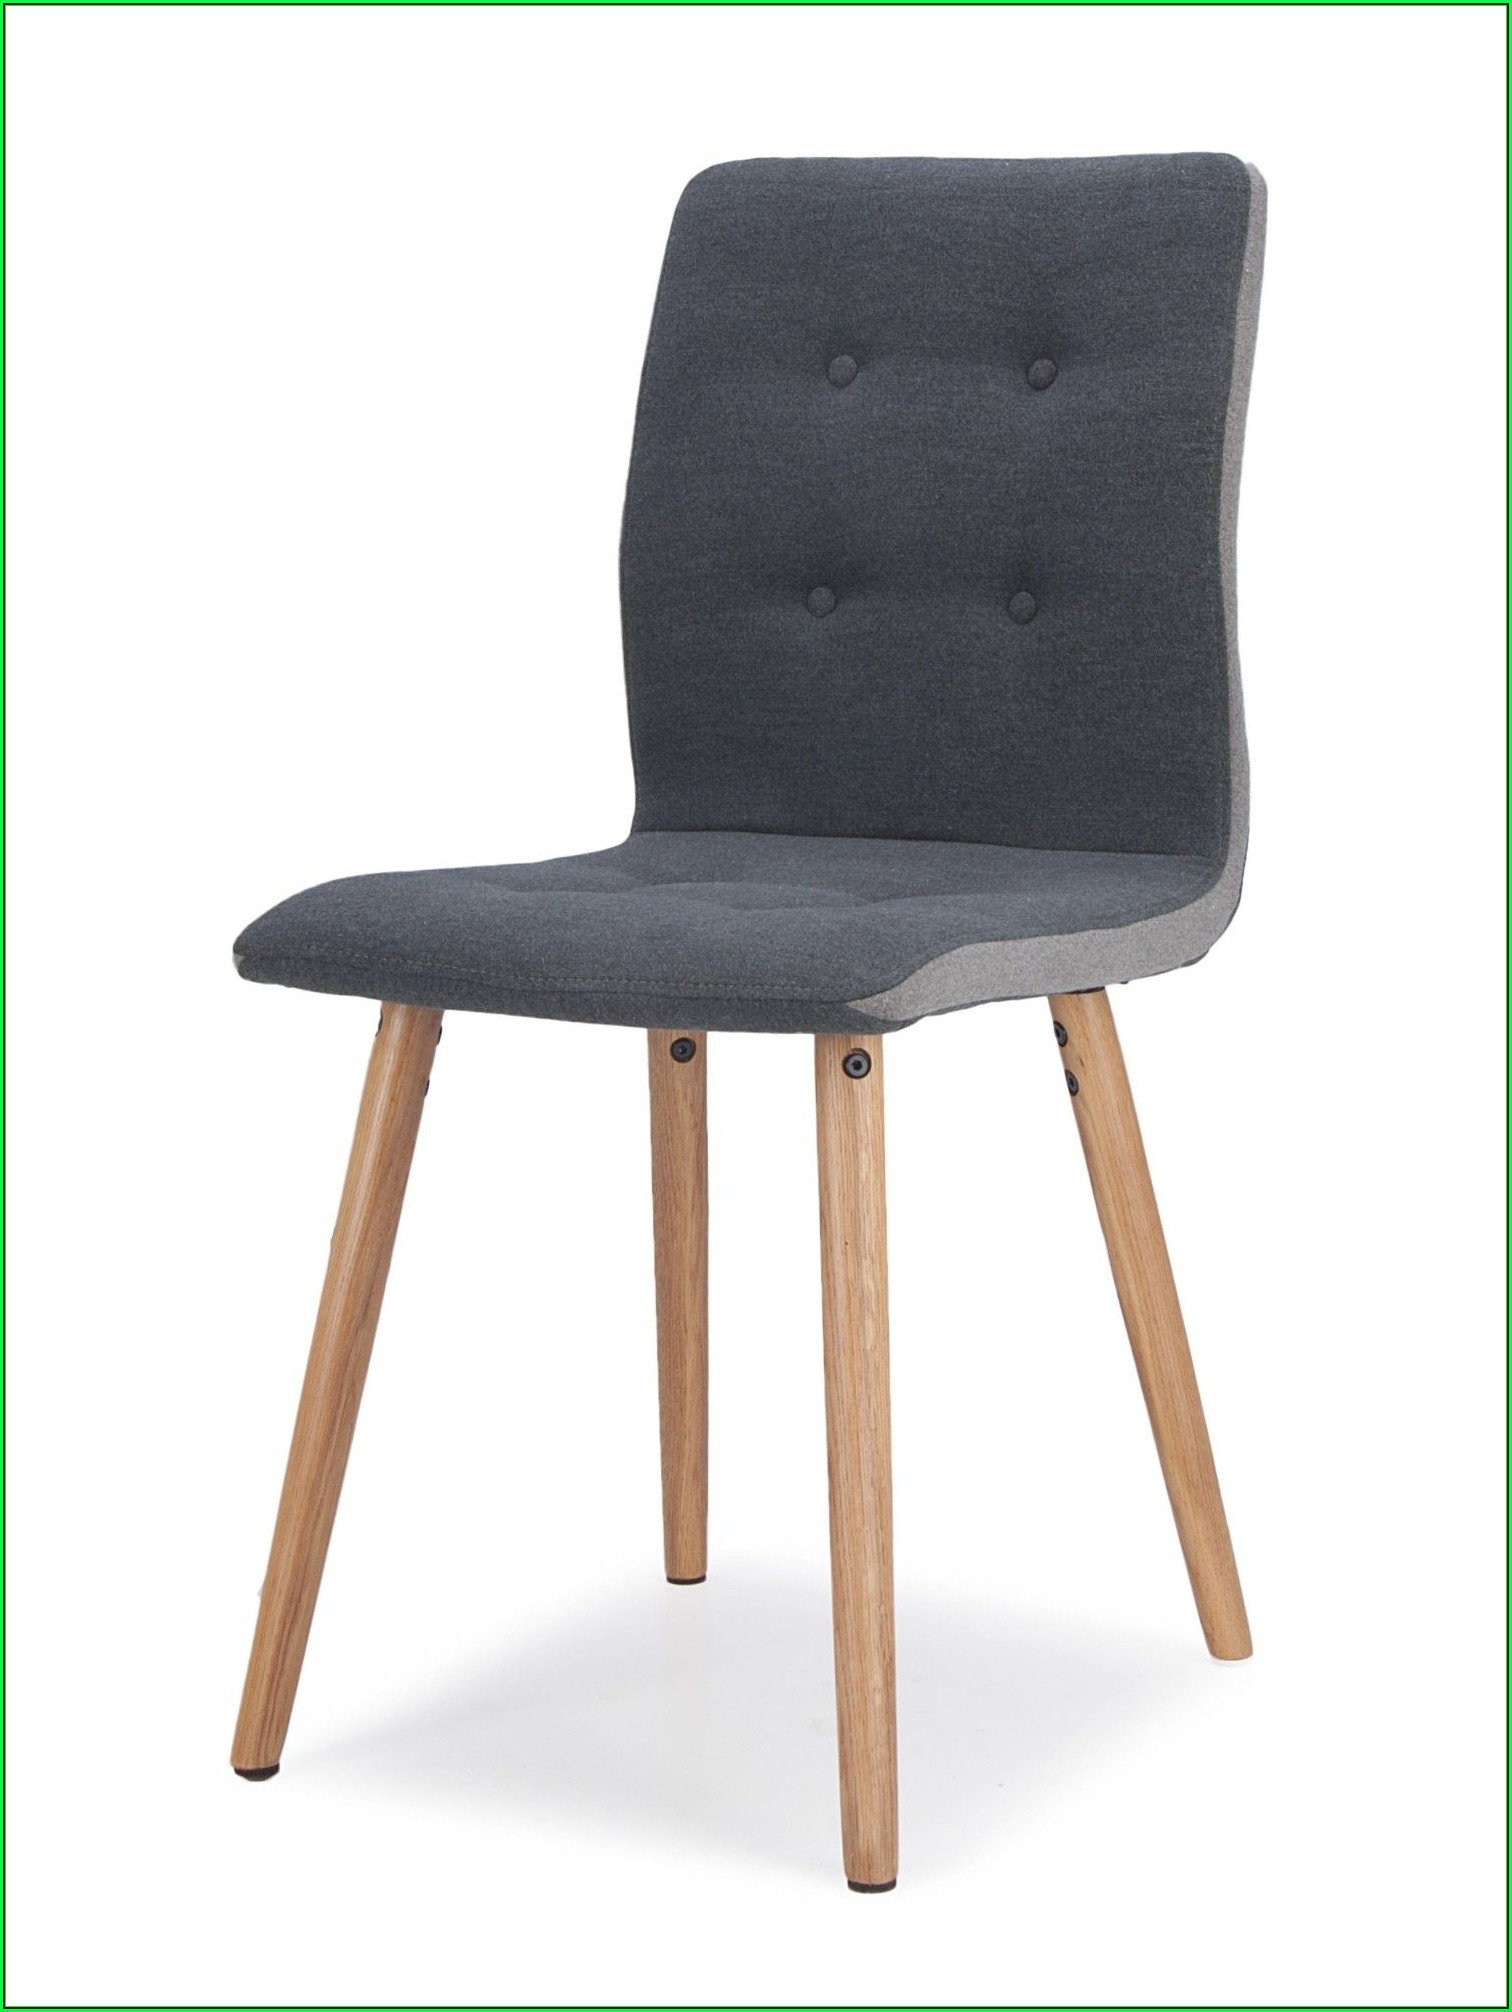 Esszimmer Stühle Ab Fabrik